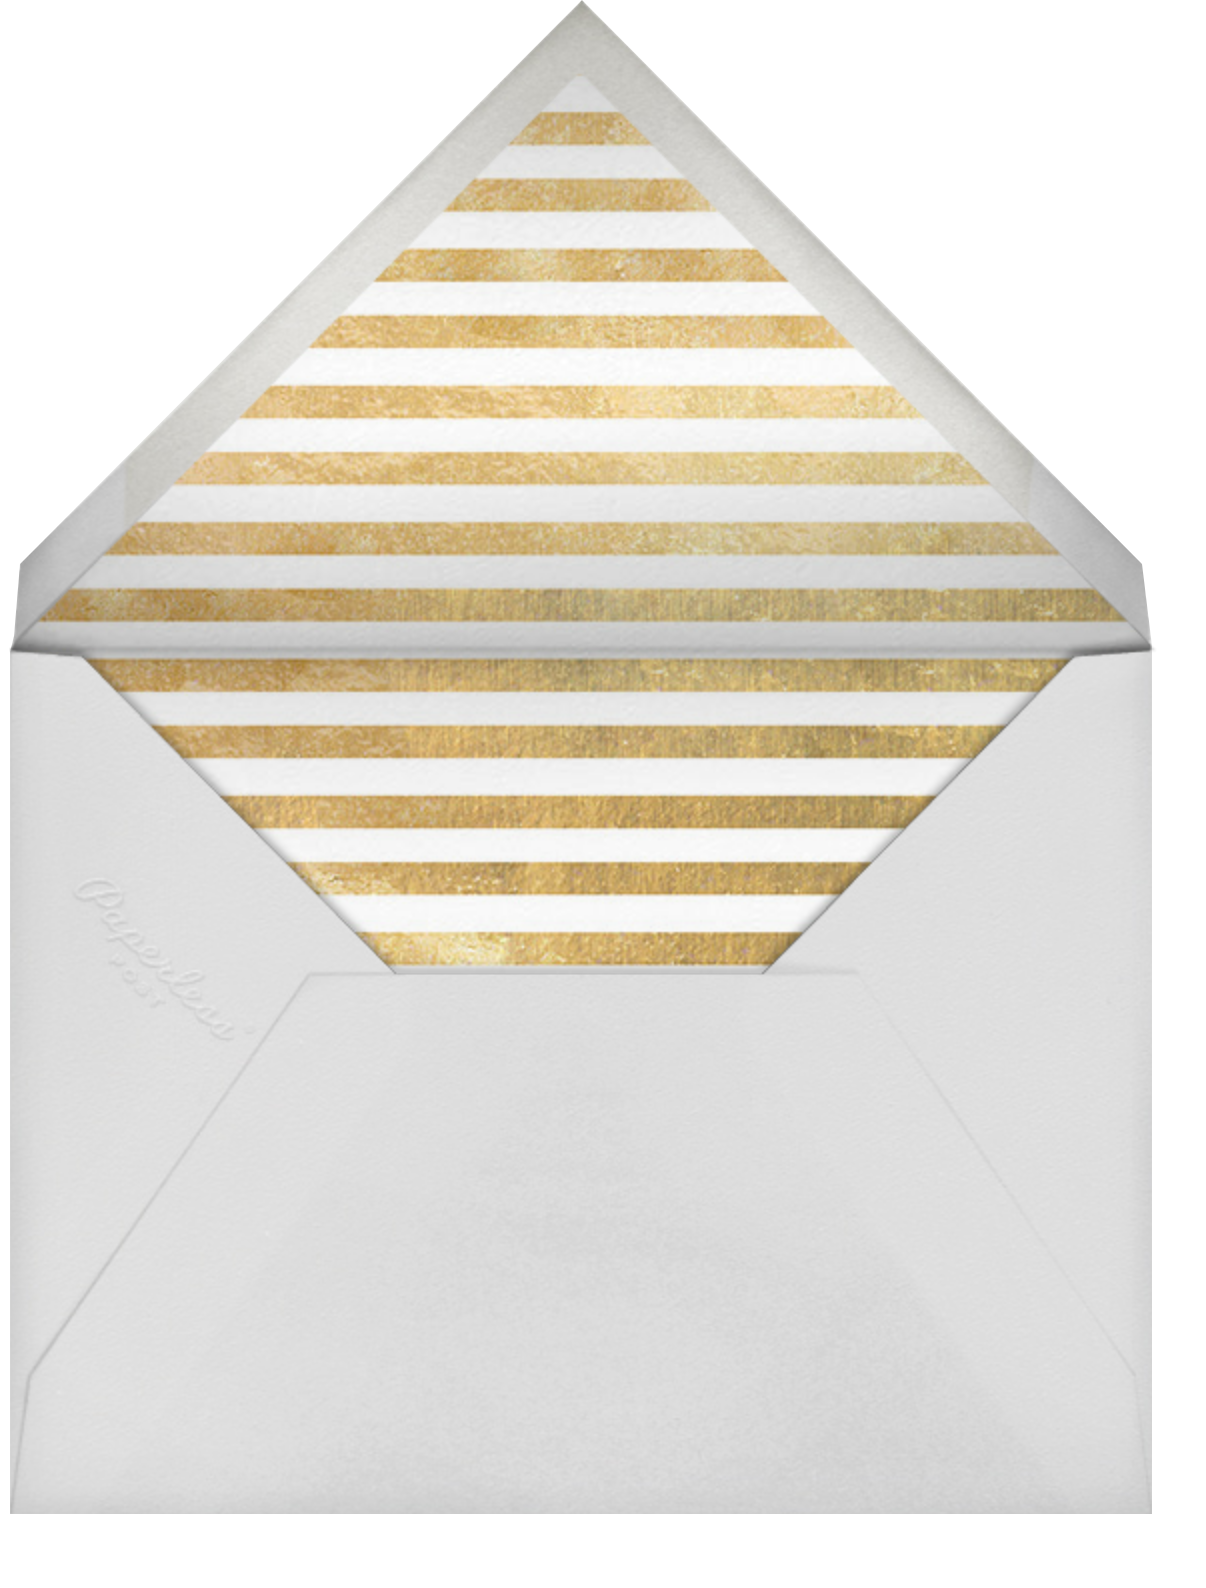 Vintage Book Save the Date (Photo) - Gold - kate spade new york - Designs we love - envelope back